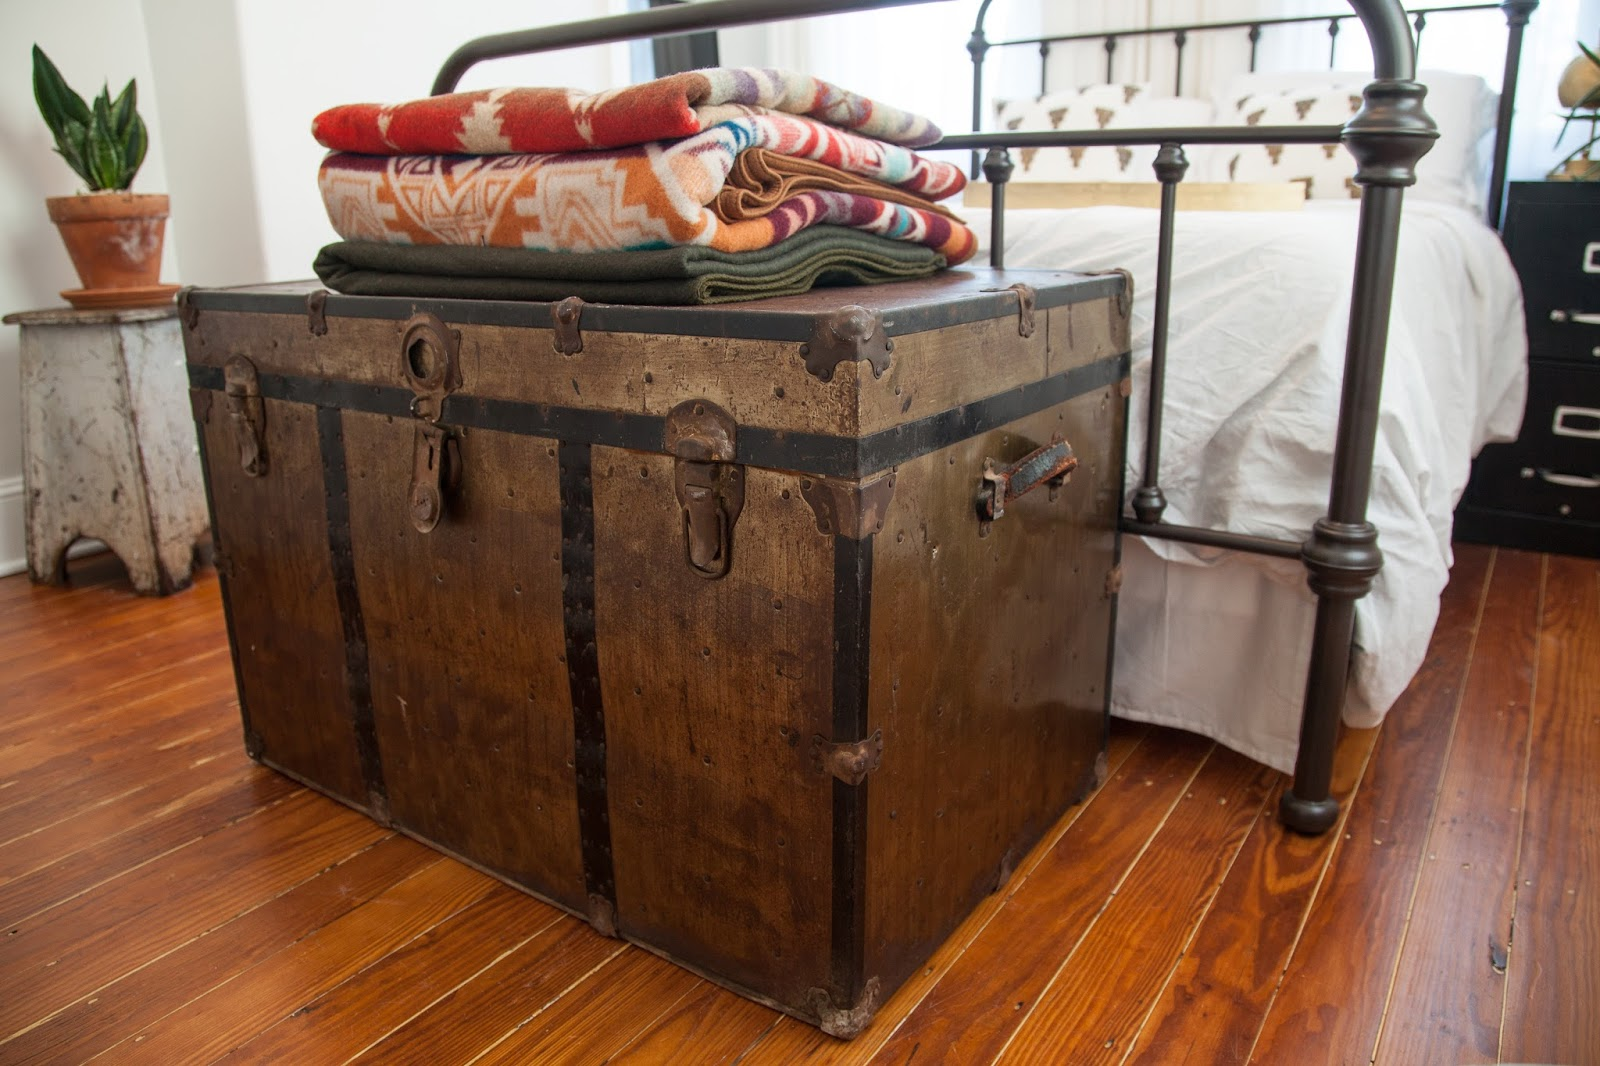 DIY Restoring a Vintage Brass Trunk